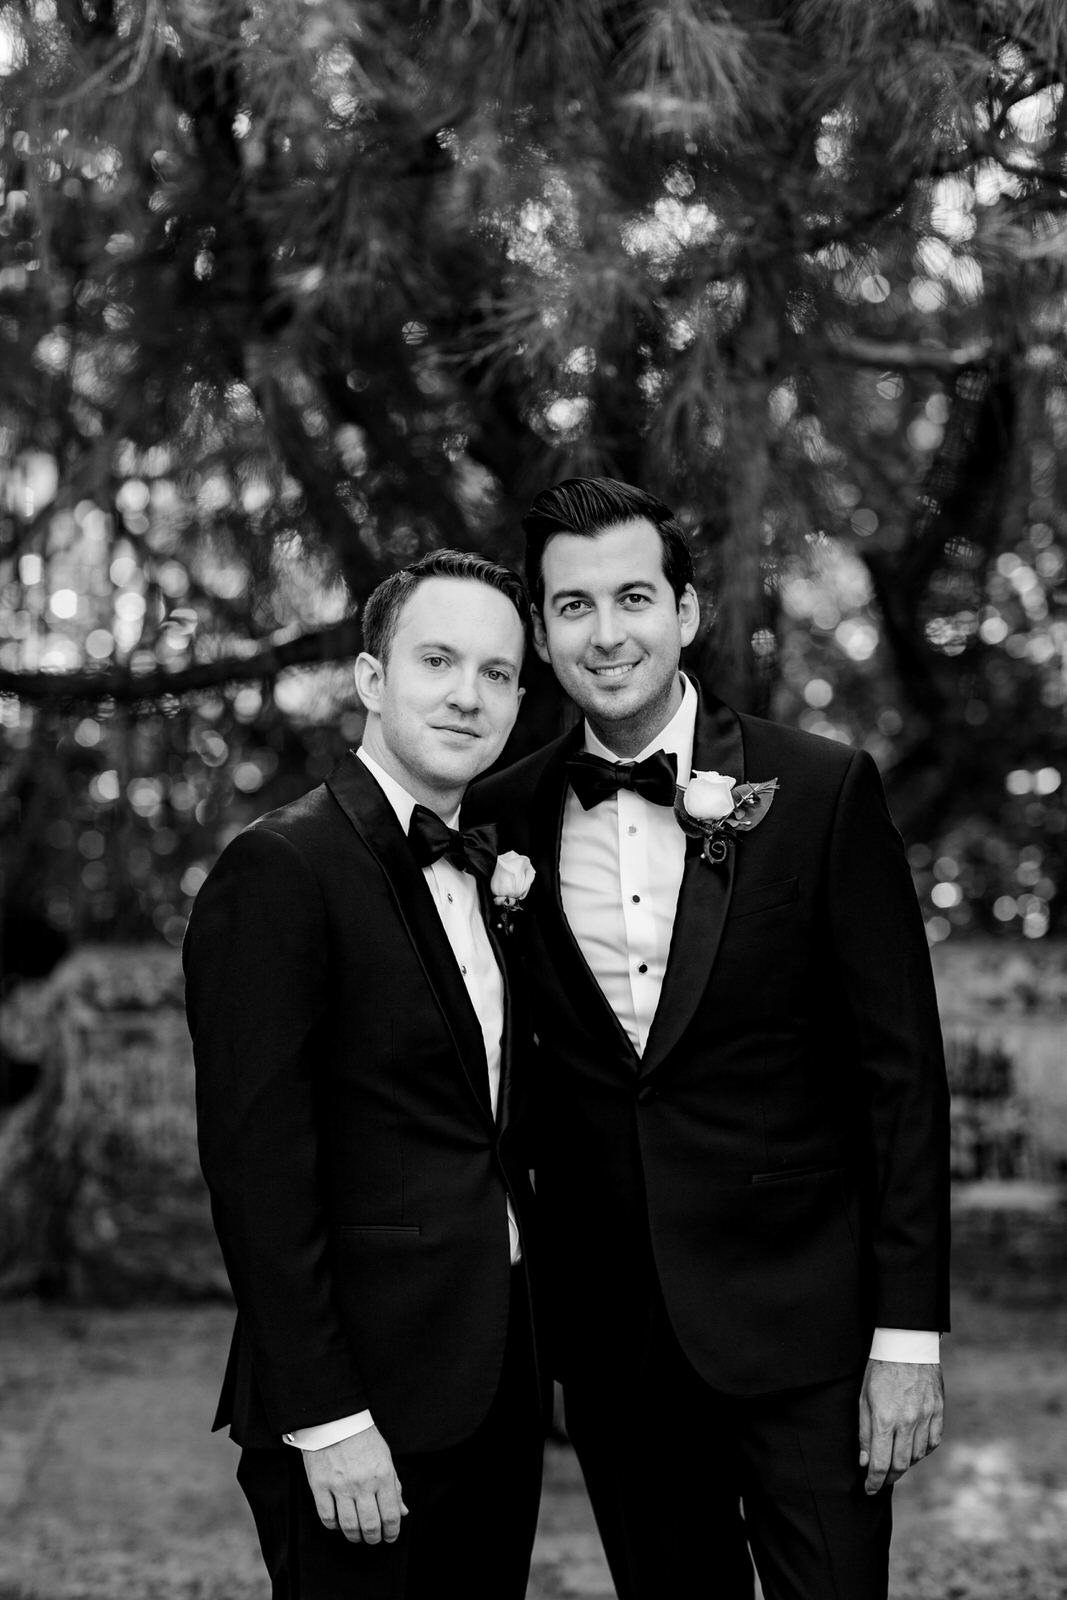 vizcaya_elopement_intimate_wedding_groom_portraits-2.jpg